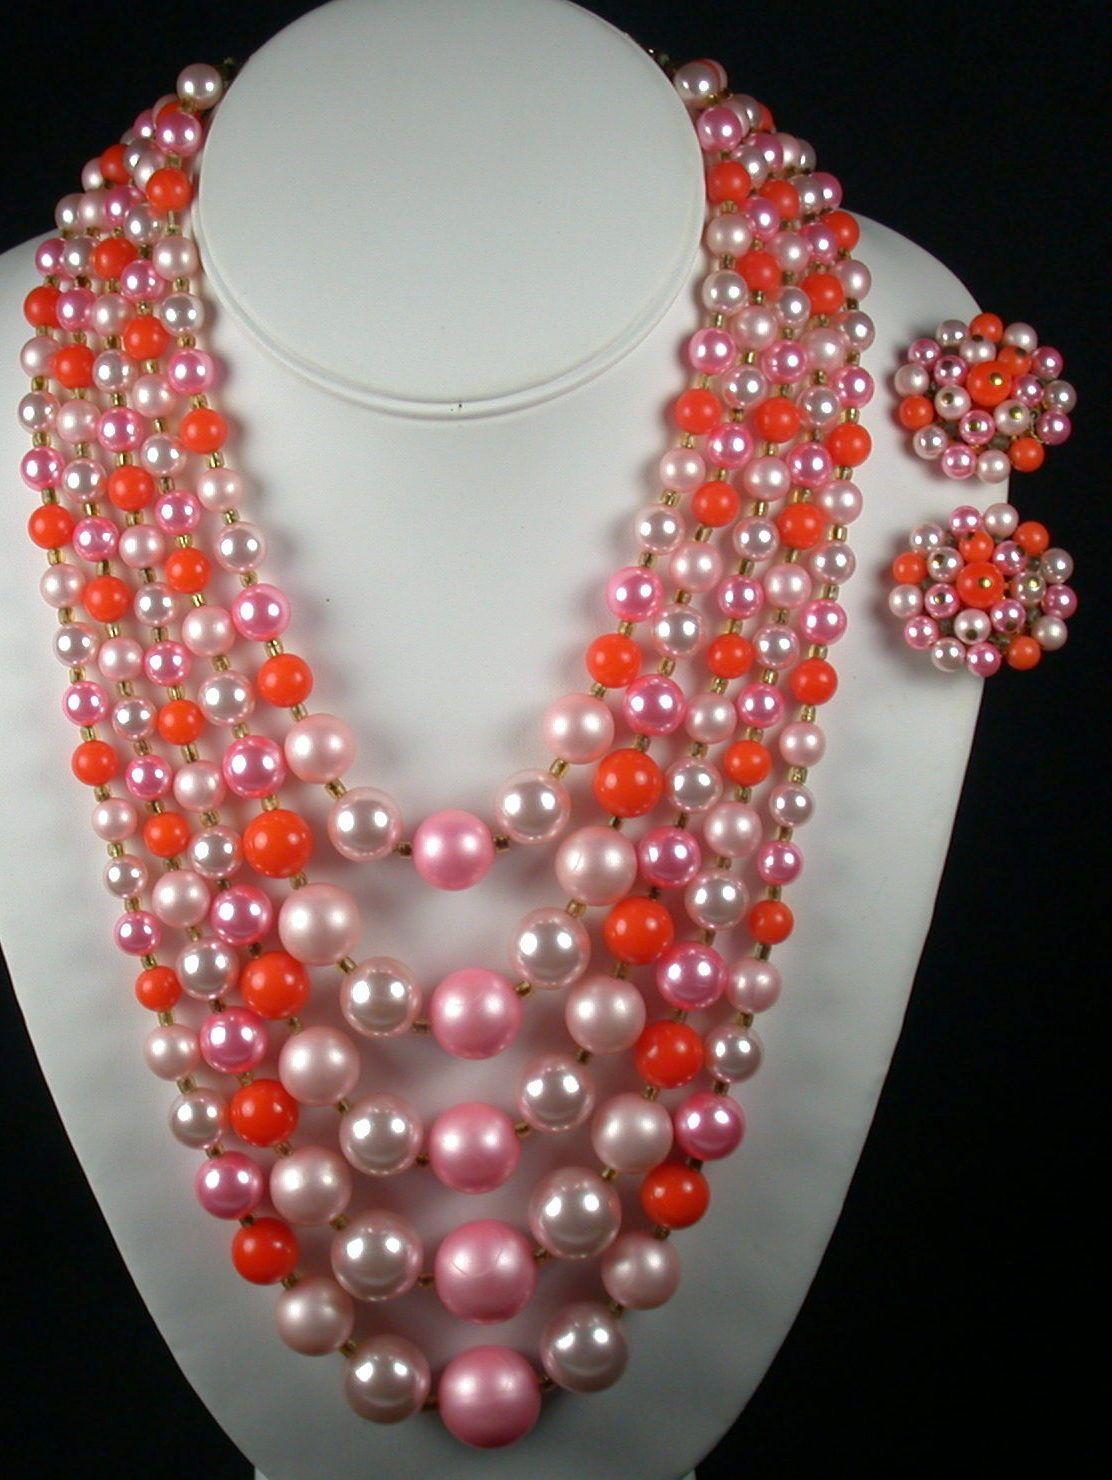 c94d343a850c69 Vintage 5 Strand Pink & Orange Beaded Necklace & Earrings Set - Japan | eBay